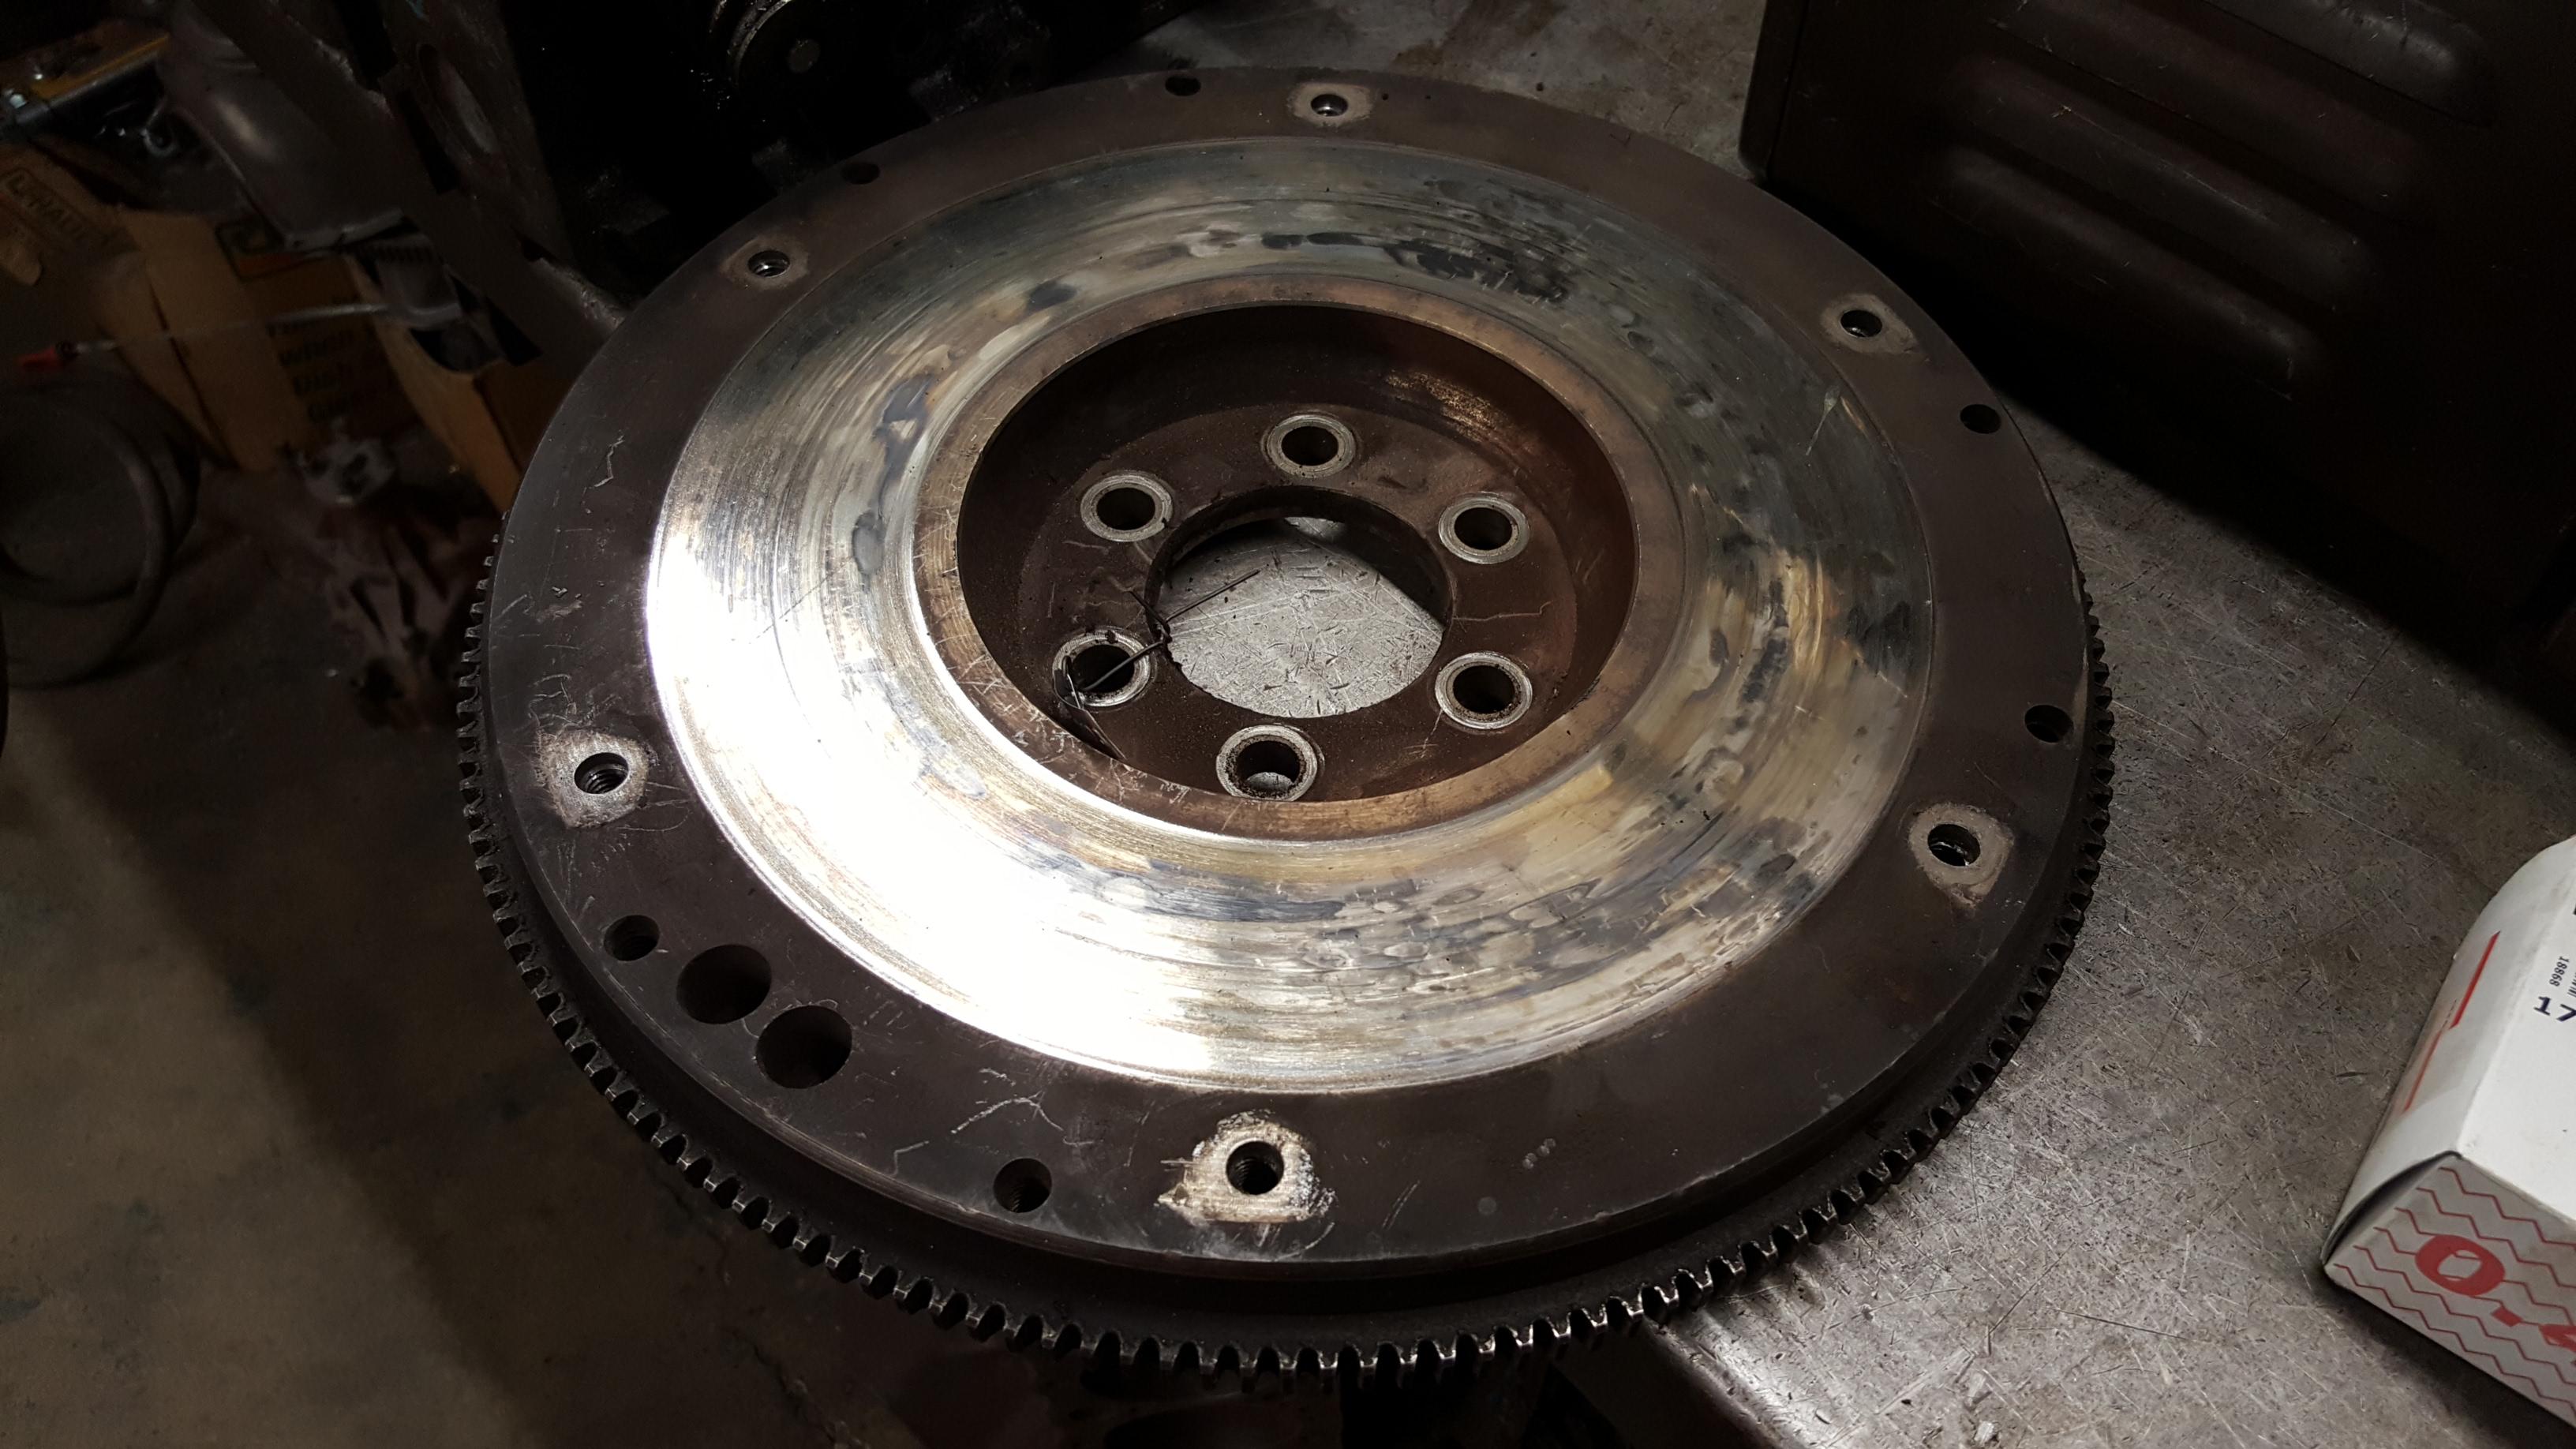 Jeep AMC 304 V8 Engine Machine Work For Rebuilding and